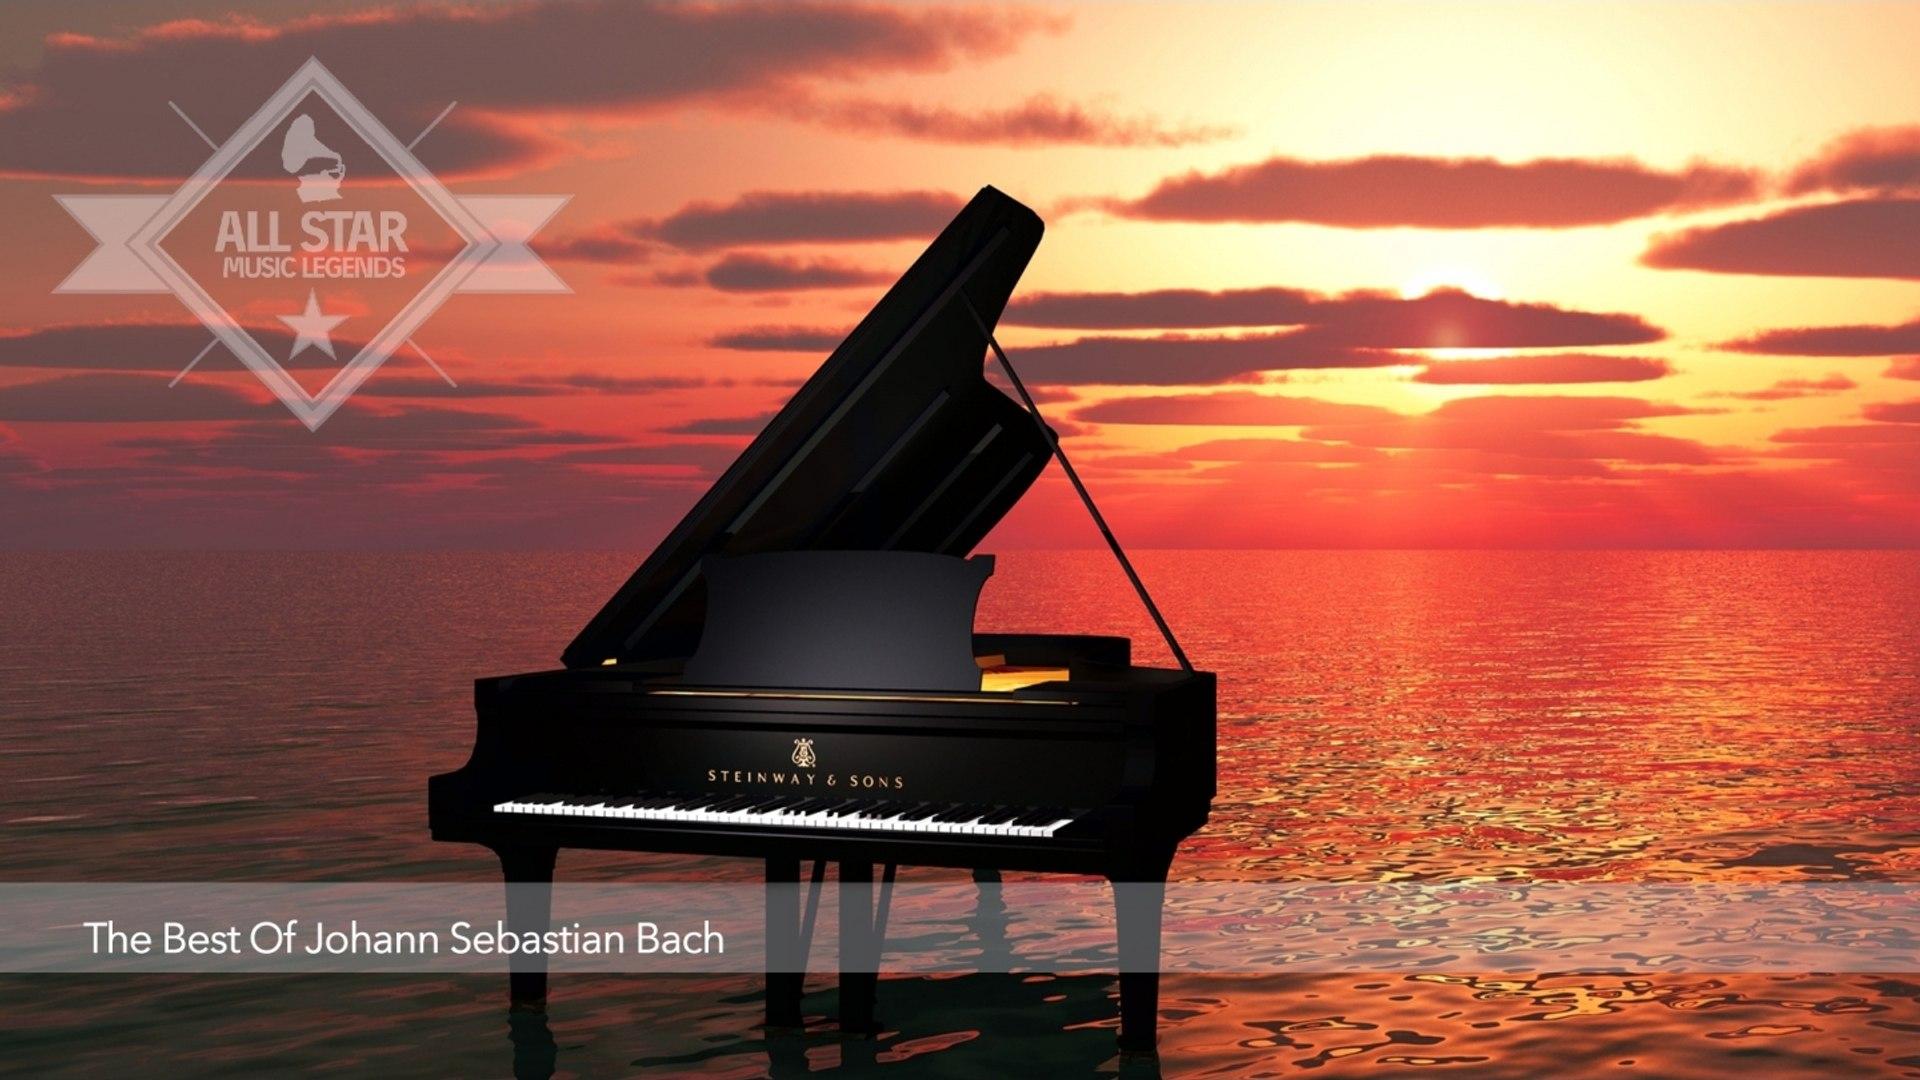 VA - Classical Music // The Best Of Johann Sebastian Bach (2 Hours) // All Star Music Legends